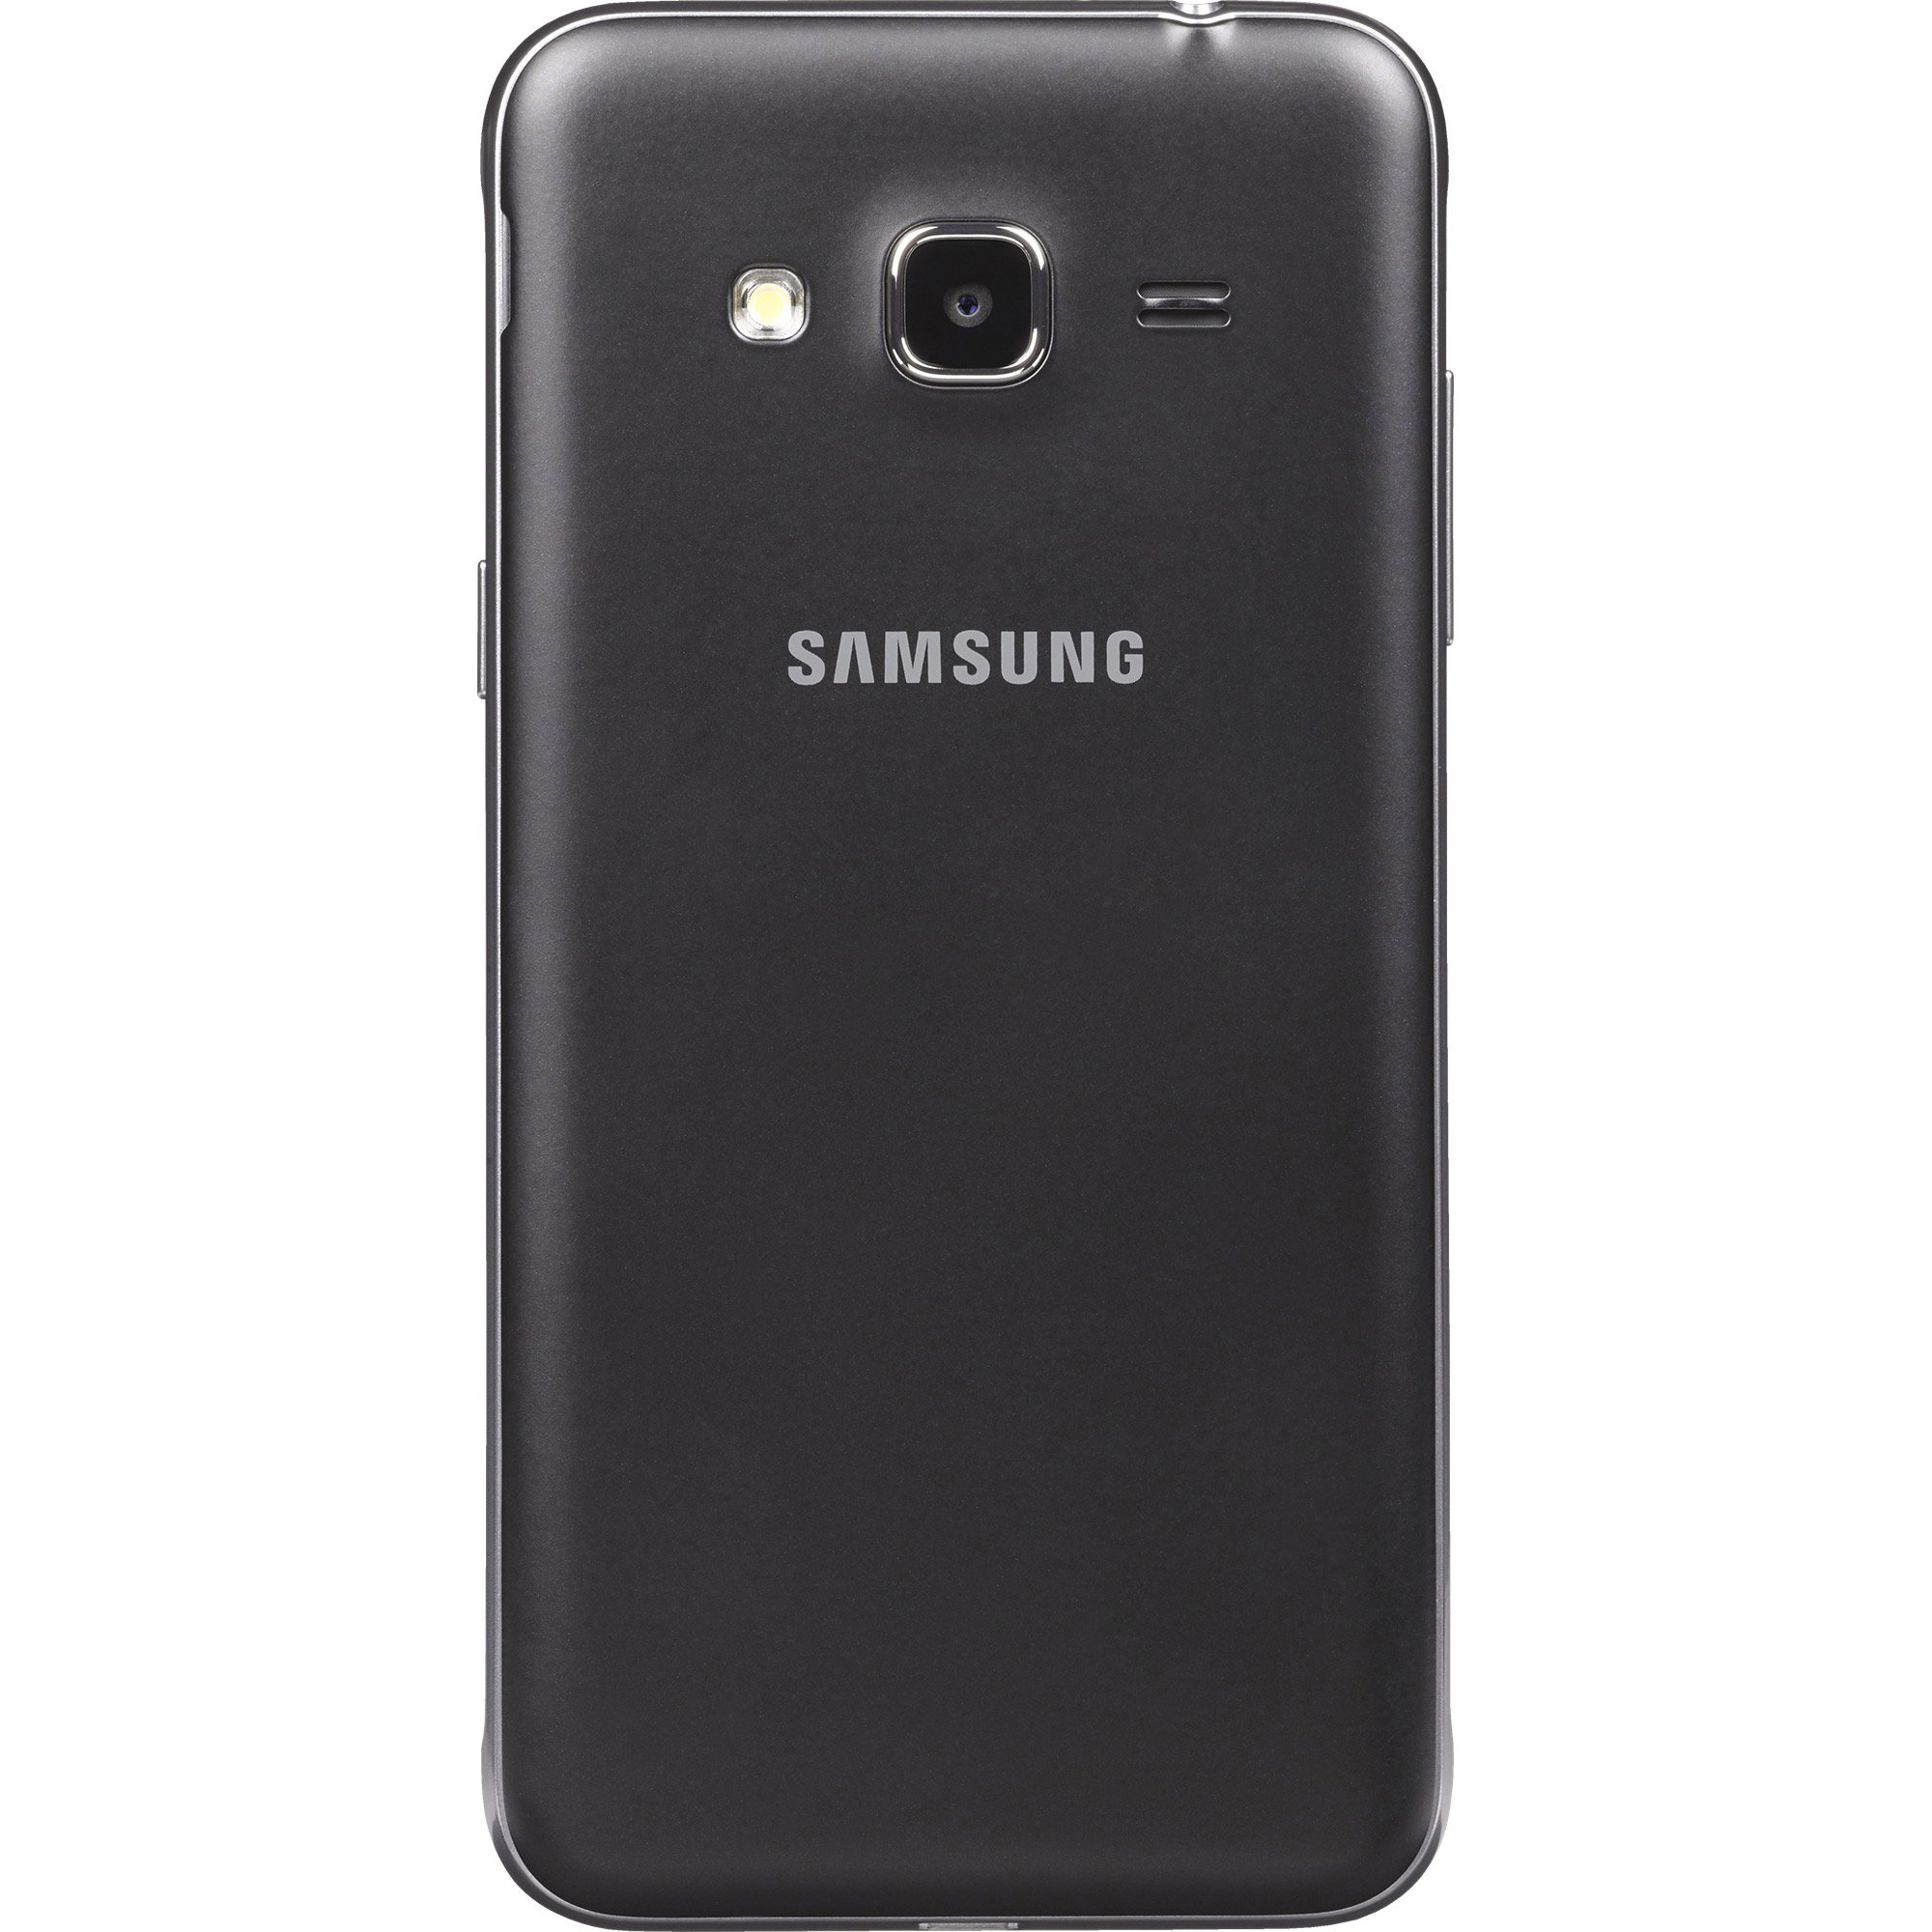 TracFone Samsung Galaxy J1 Luna 4G LTE Prepaid Smartphone by TracFone (Image #2)